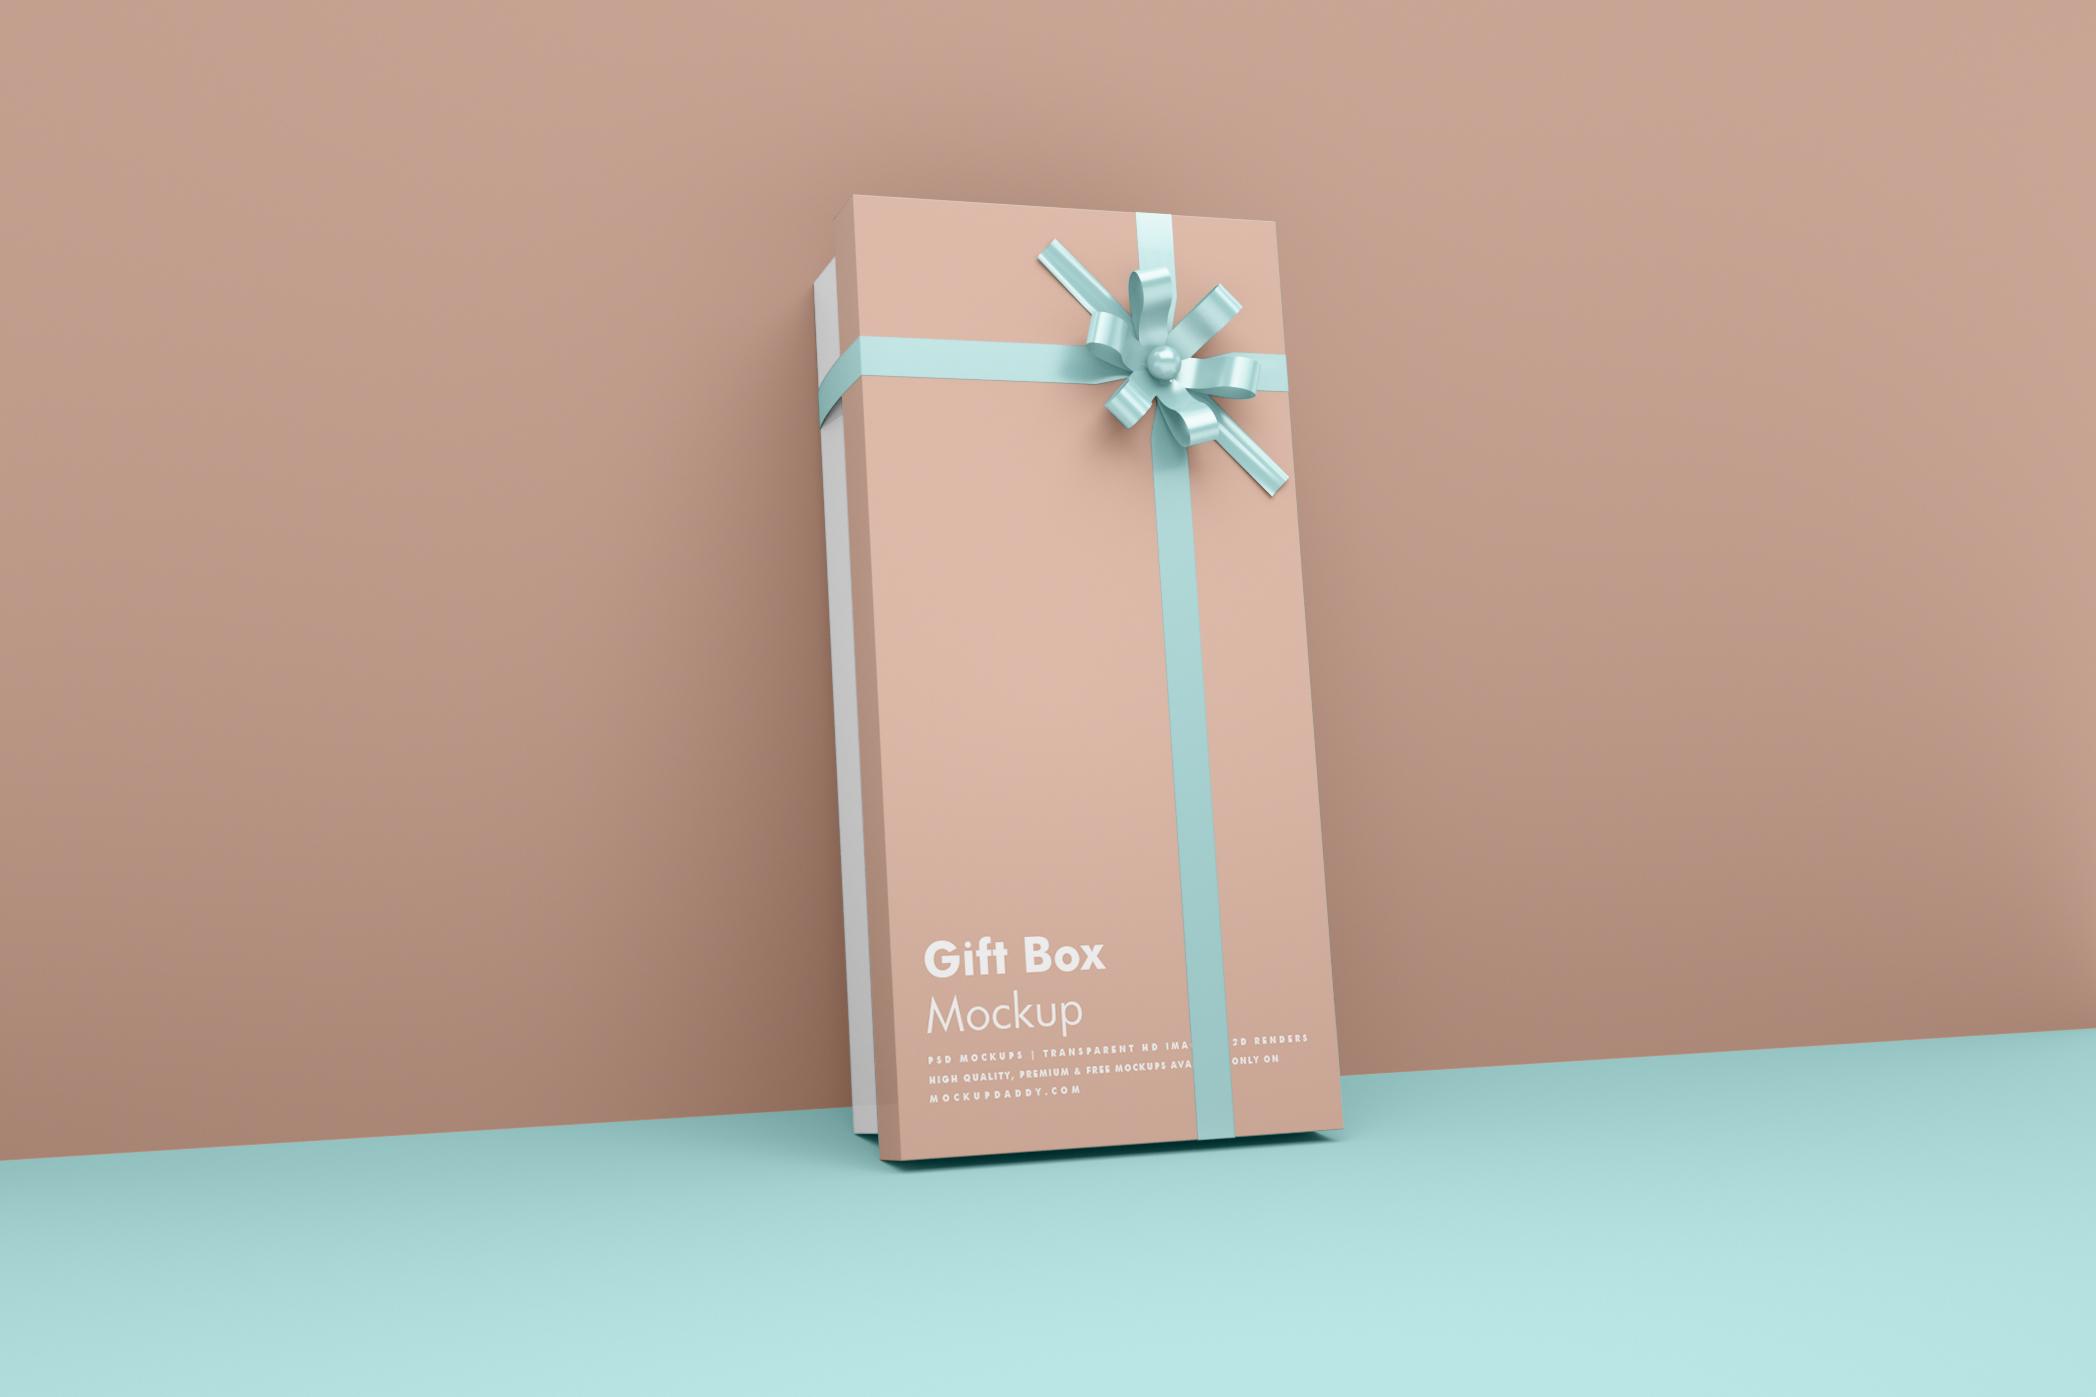 Gift Box Mockup Free And Premium Psd Mockups